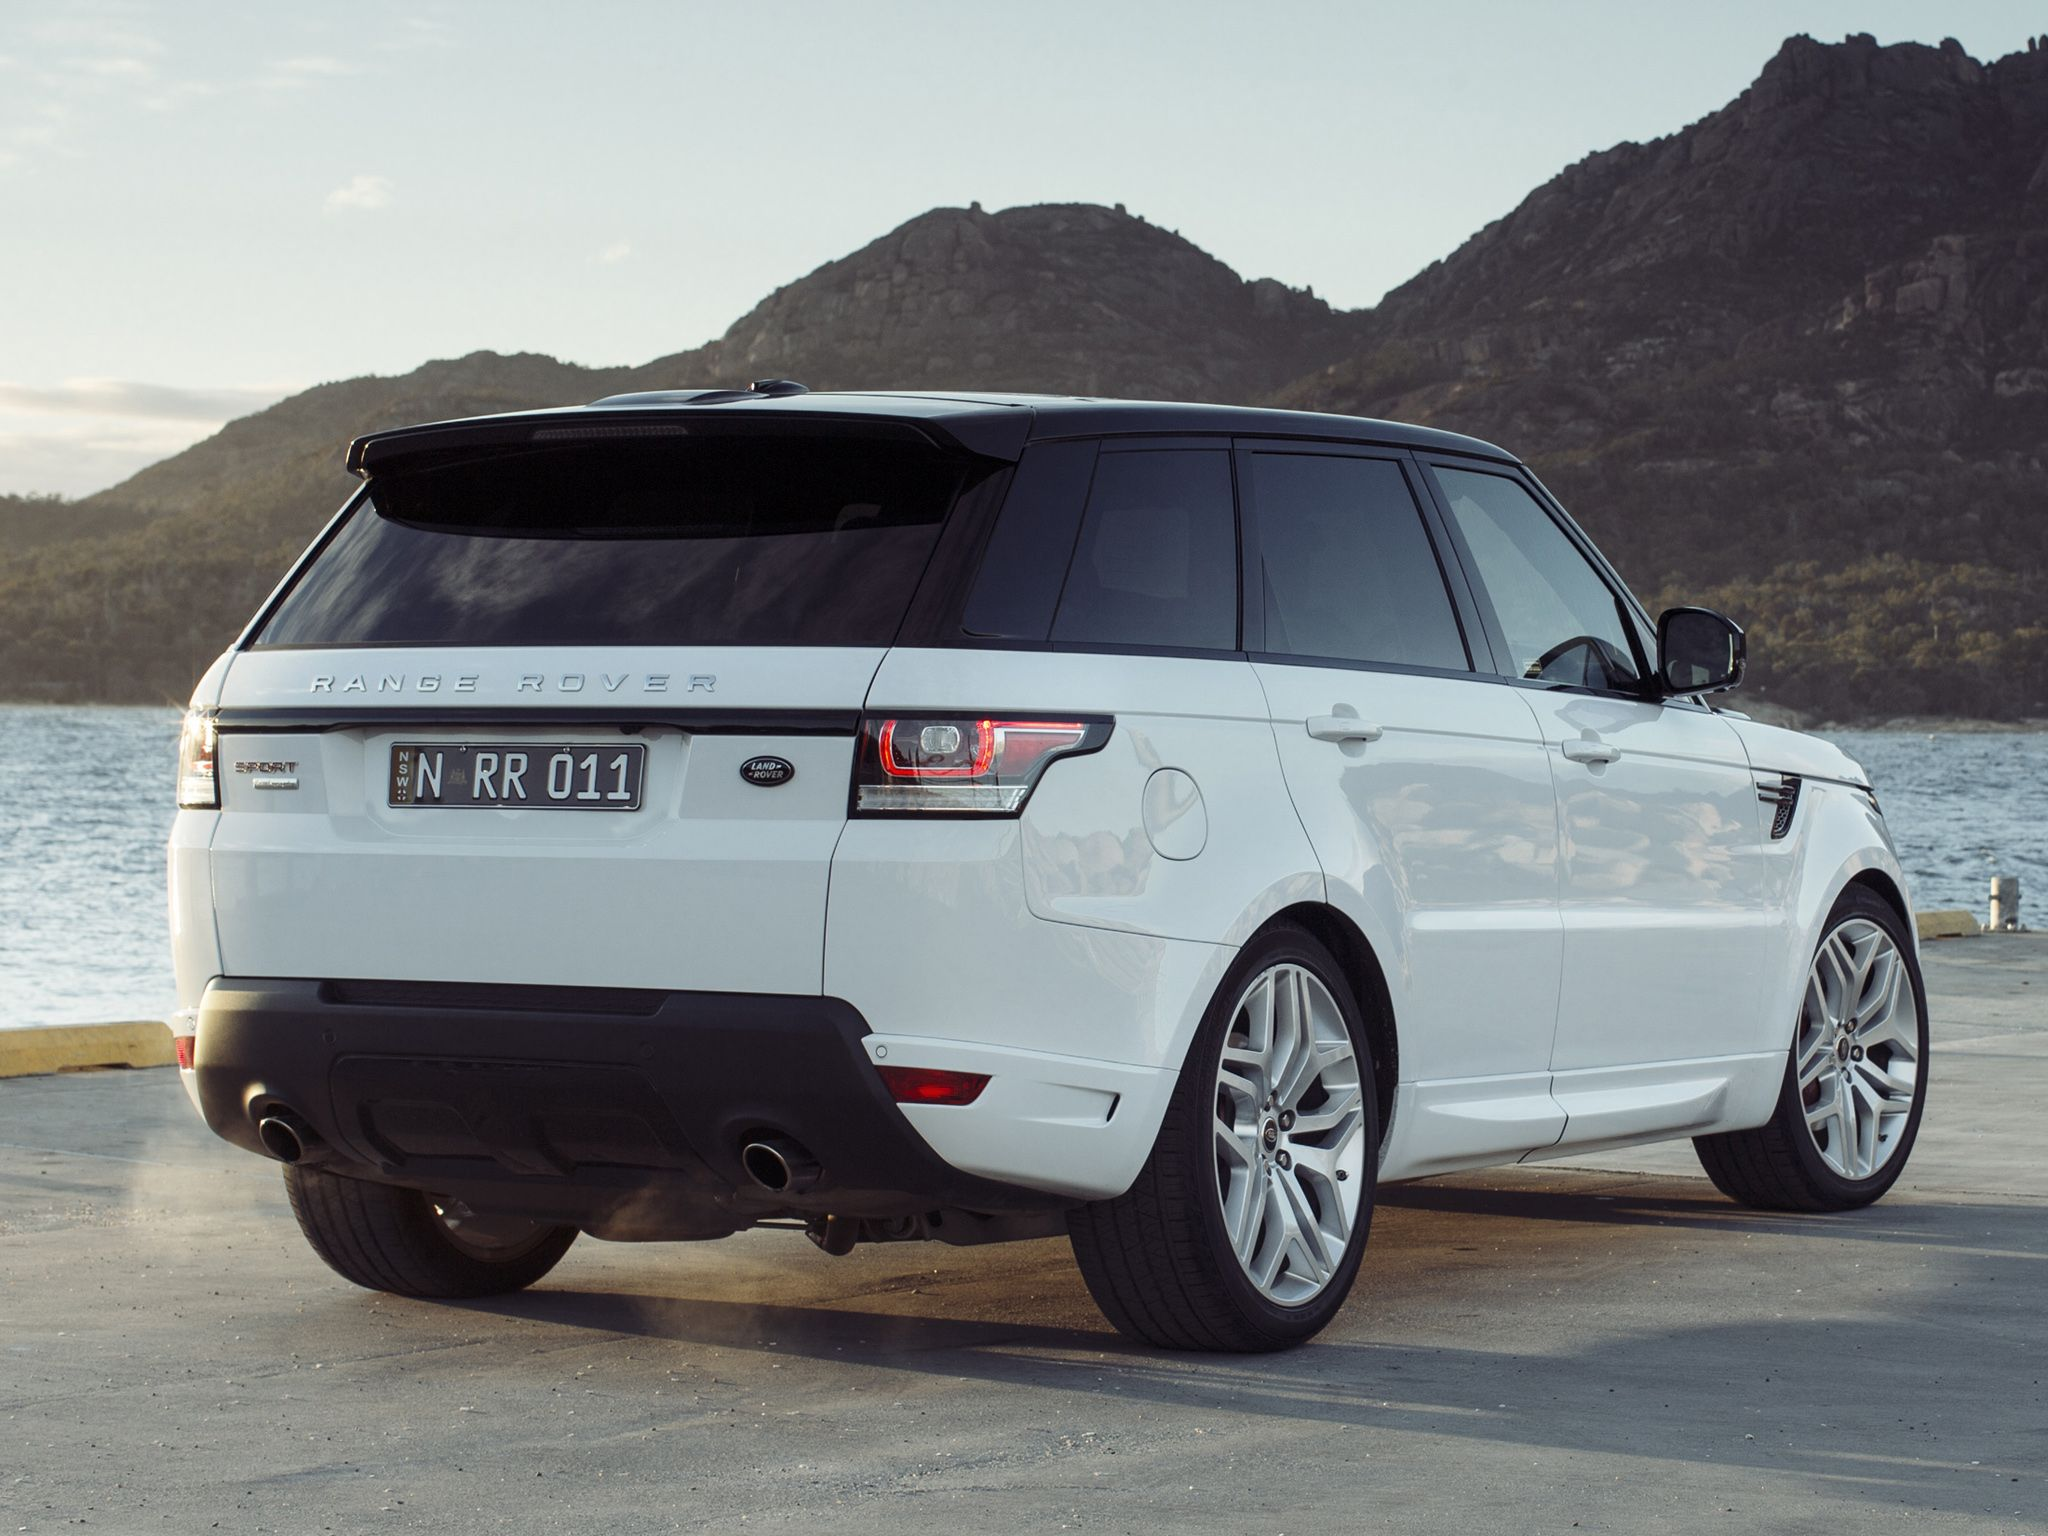 2014 Range Rover Sport Autobiography Black Range Rover Sport Range Rover Range Rover Sport Autobiography